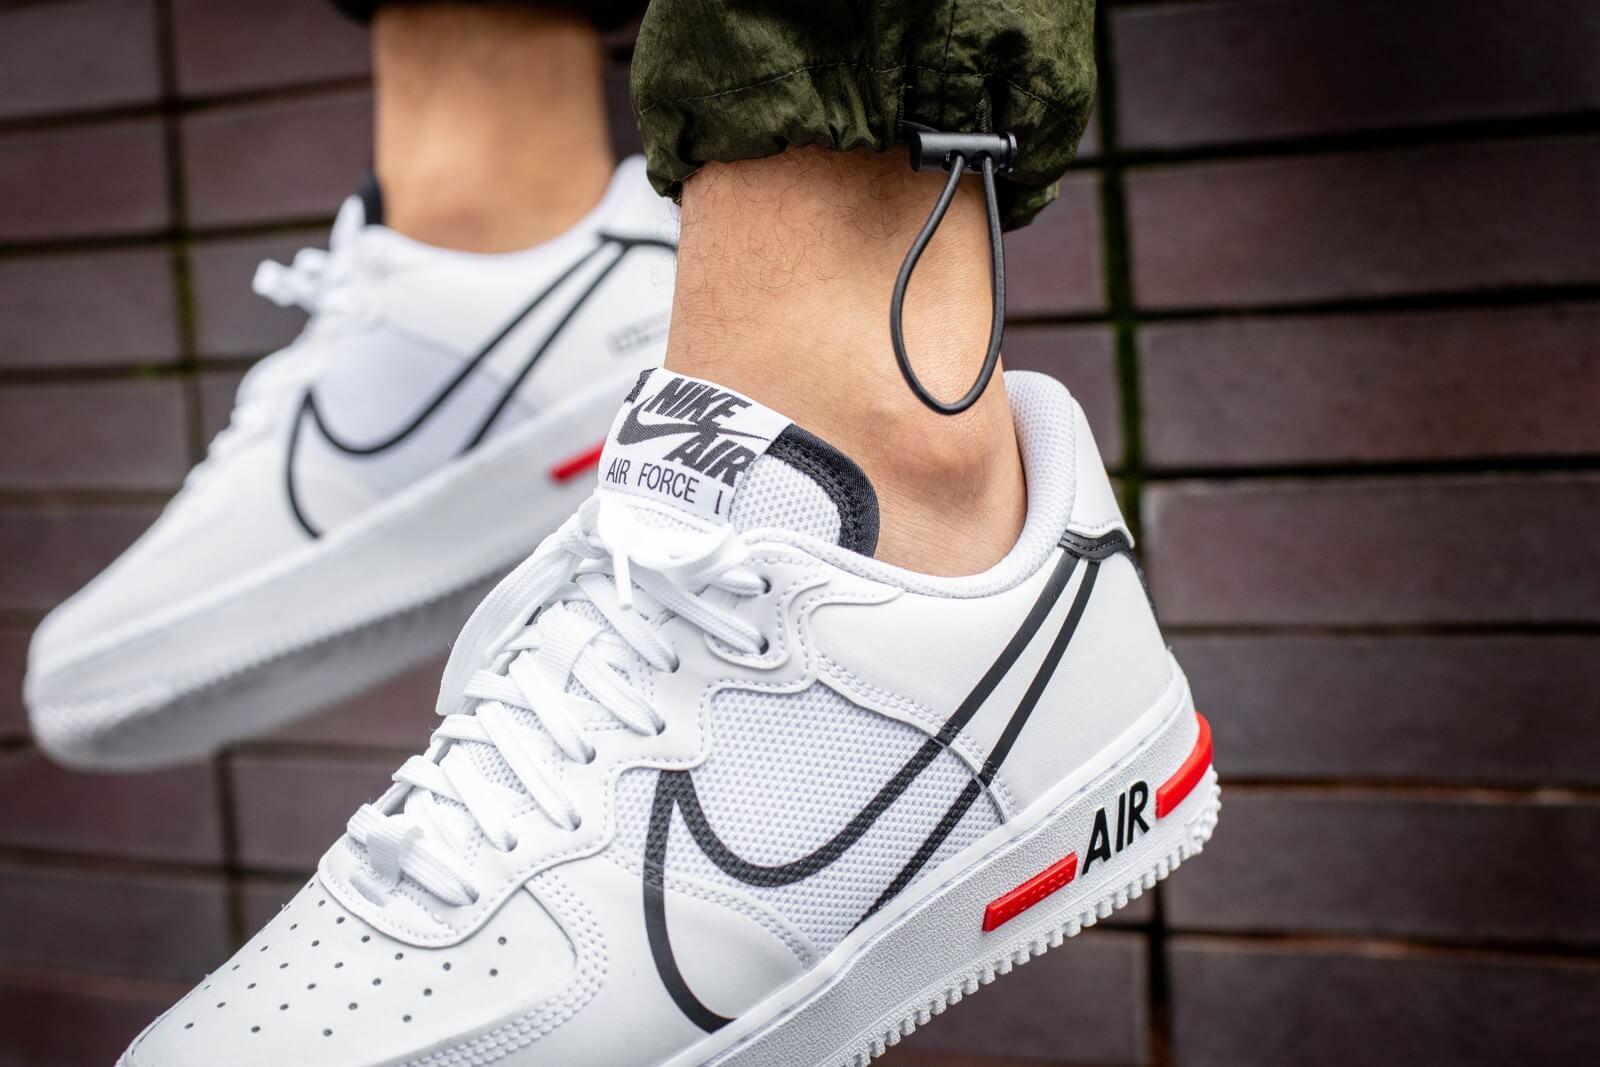 Nike Air Force 1 React White/Black-University Red - CD4366-100